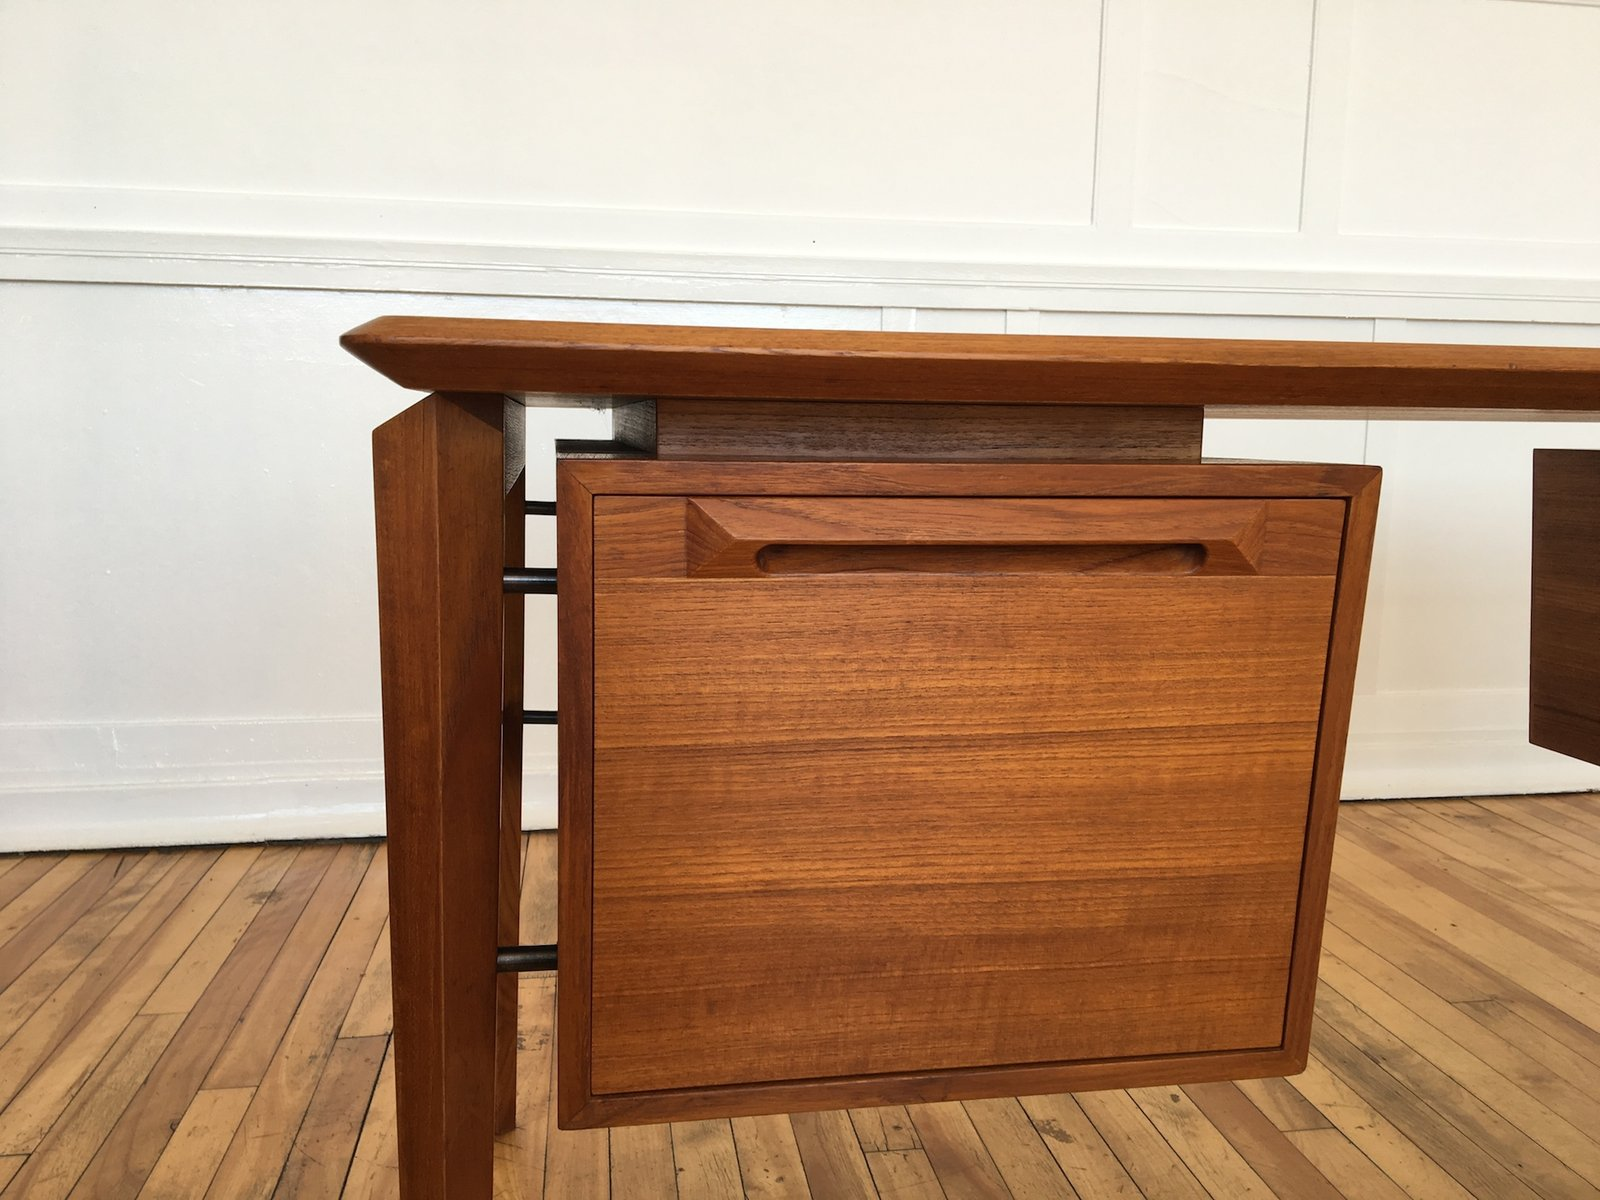 bureau mid century en teck par ib kofod larsen pour seffle mobelfabrik danemark en vente sur pamono. Black Bedroom Furniture Sets. Home Design Ideas